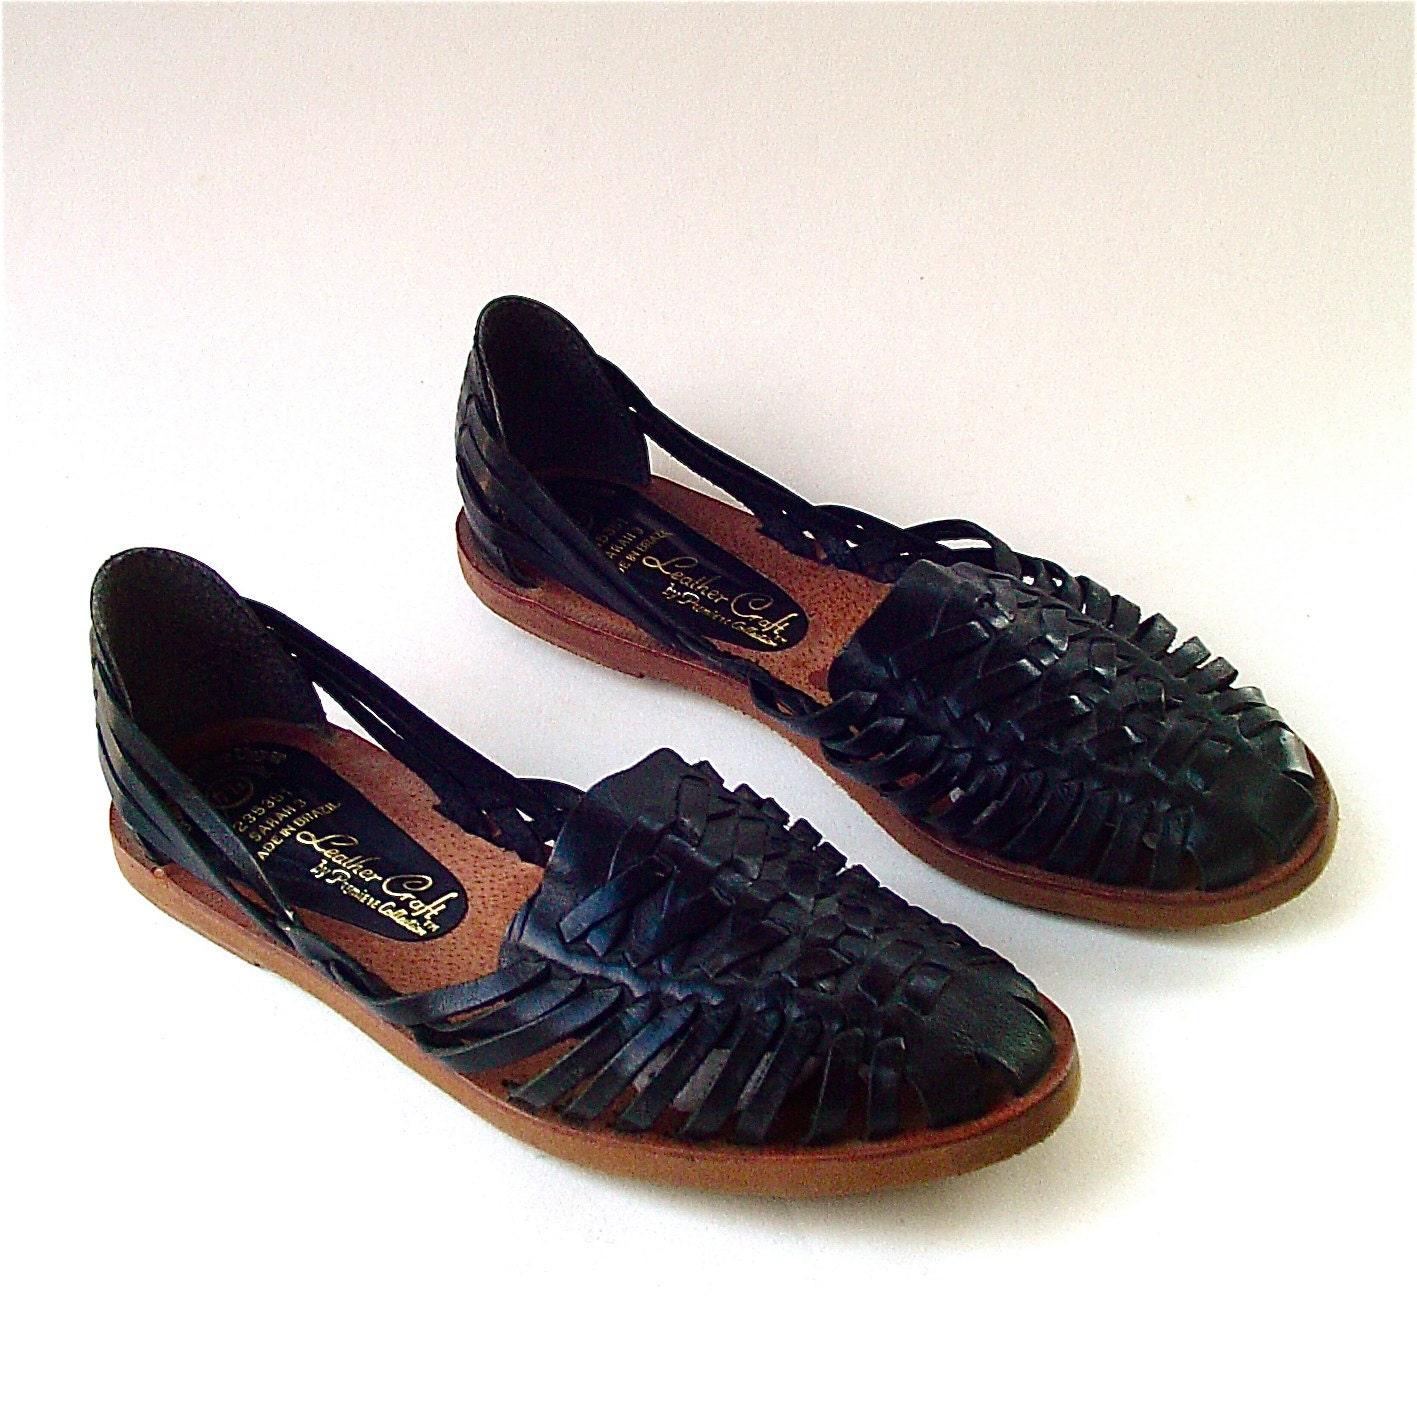 Huarache Shoes Soft Leather Etsy